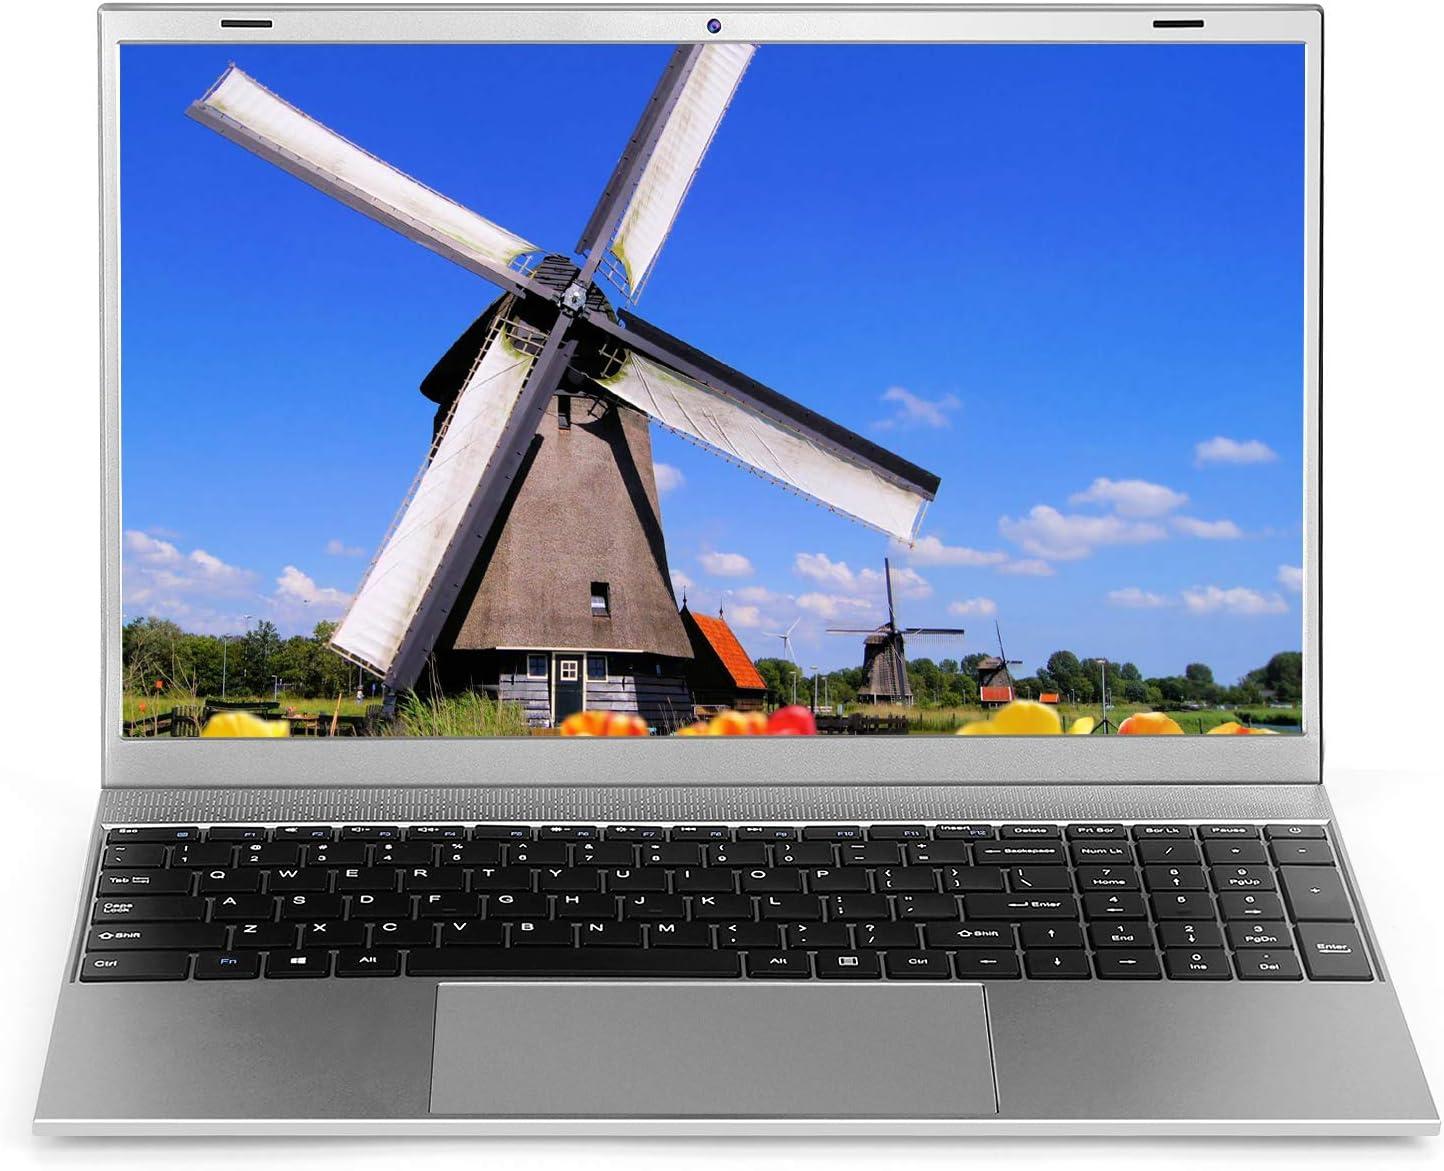 Laptop 15.6 inch Windows 10 Notebook 8GB RAM 128GB SSD - YELLYOUTH 15.6